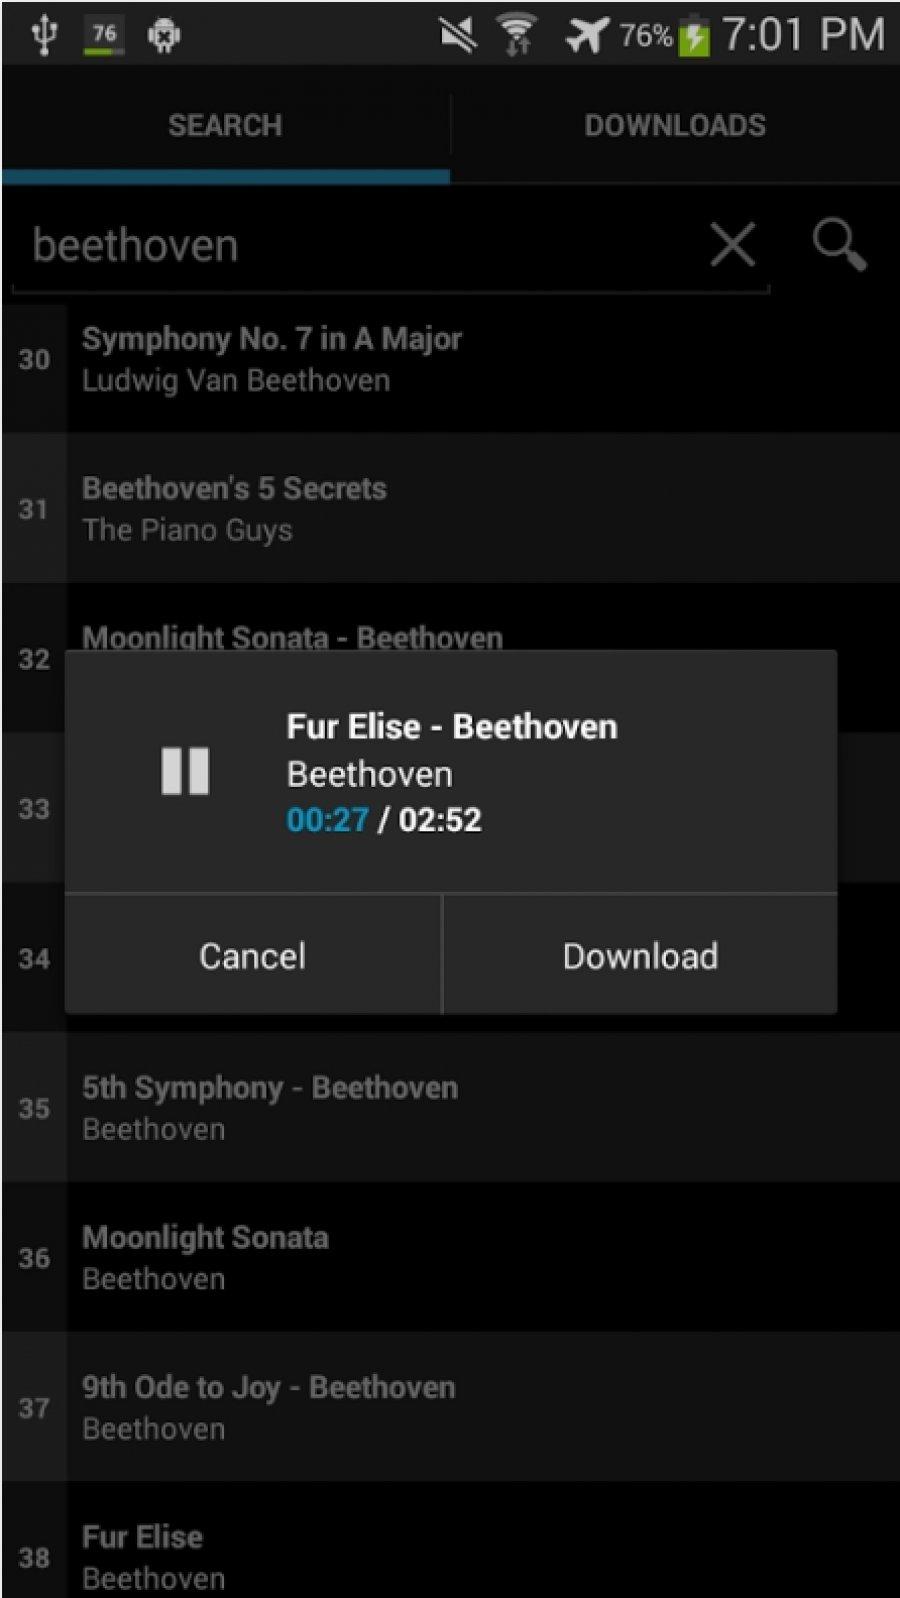 SuperCloud MP3 Downloader